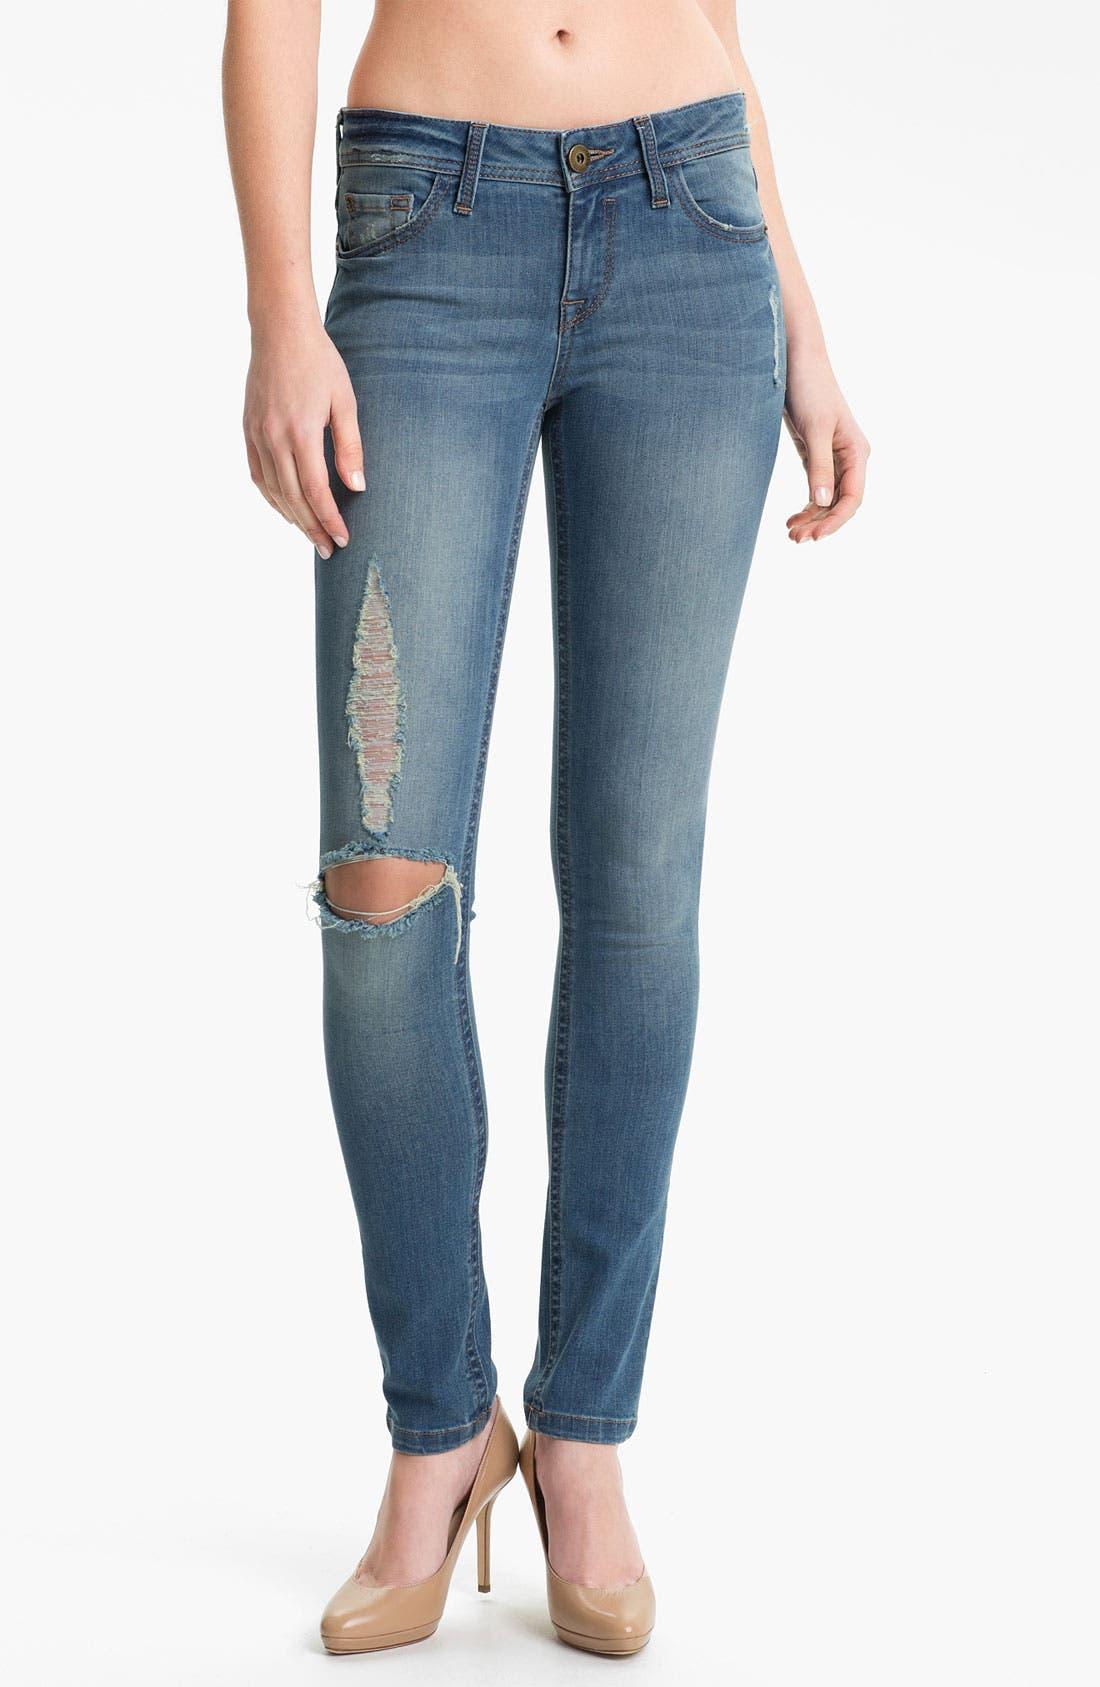 Main Image - DL1961 'Amanda' X-Fit Stretch Destroyed Denim Skinny Jeans (Mayhem)